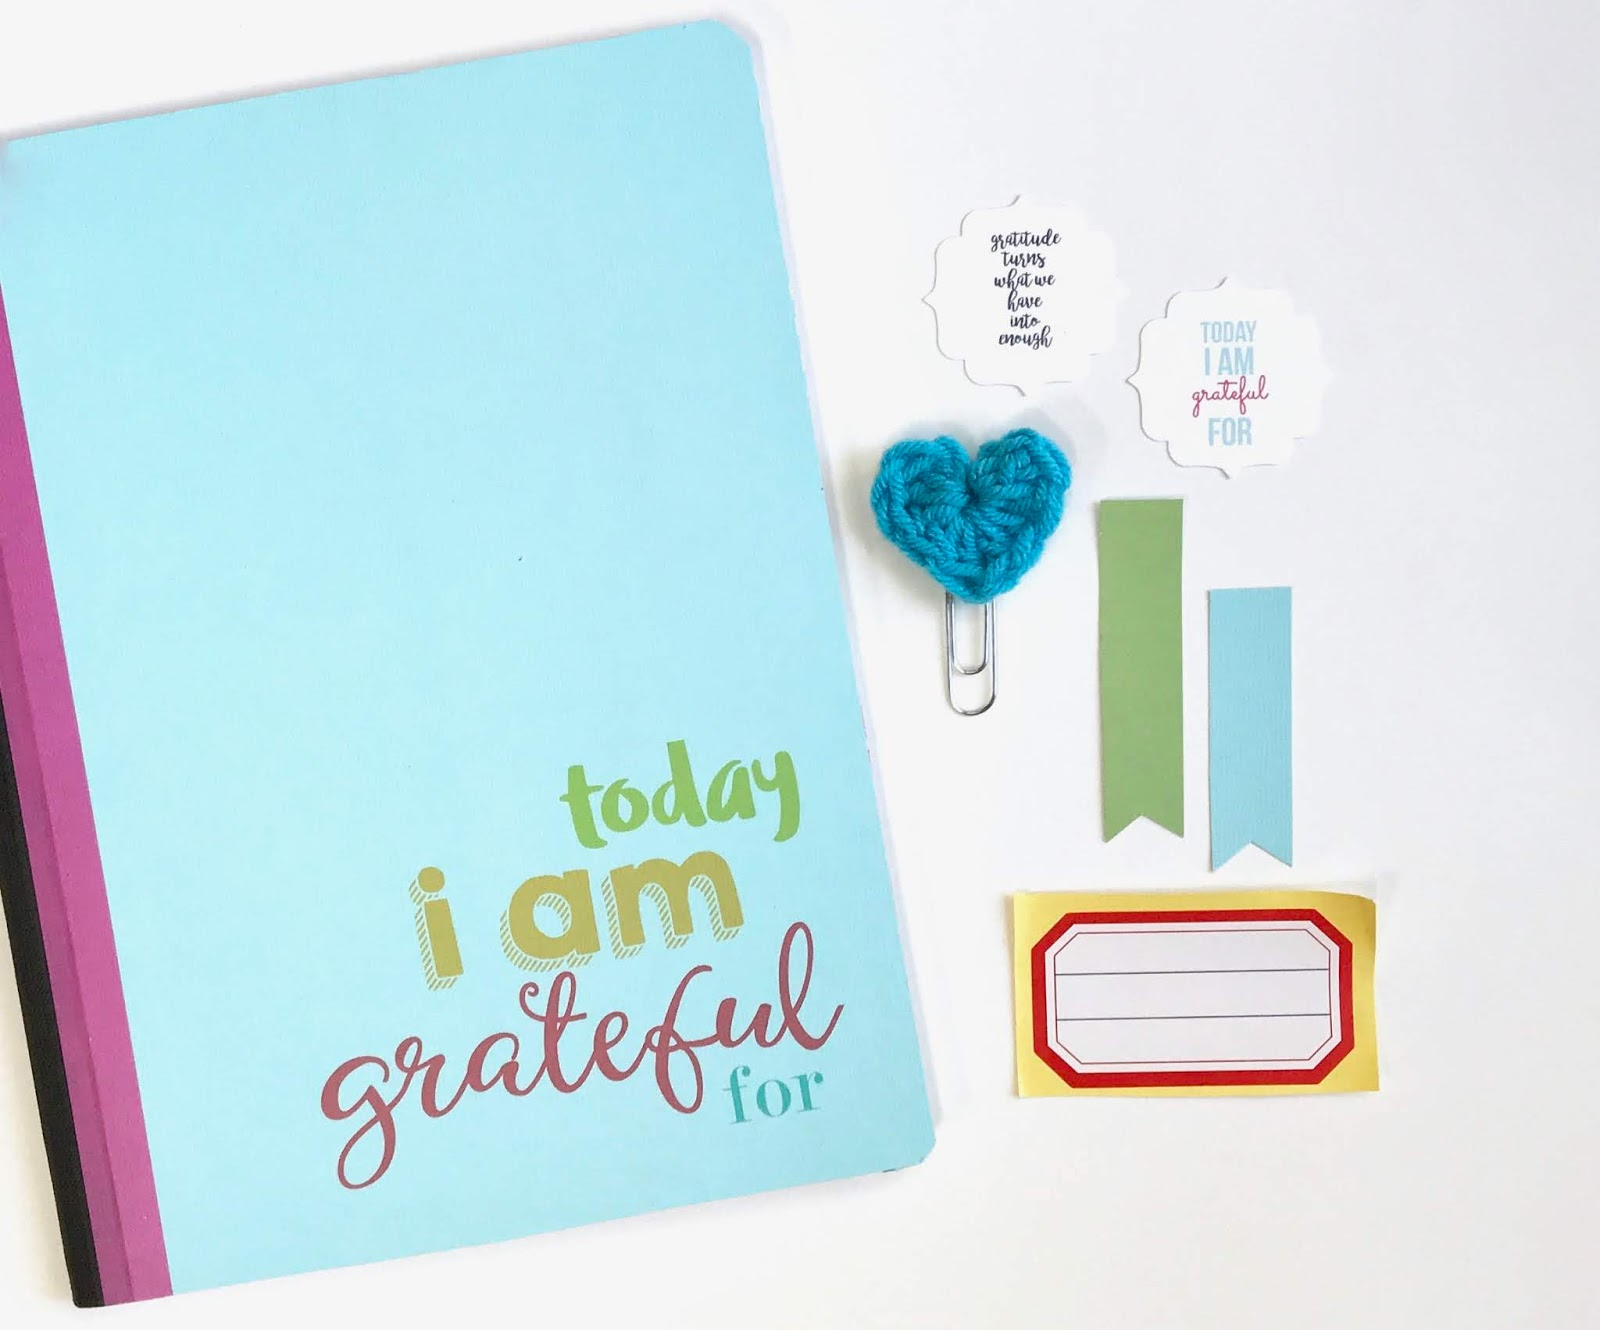 #gratitude journal #journaling #grateful #gratefulness #mindfulness